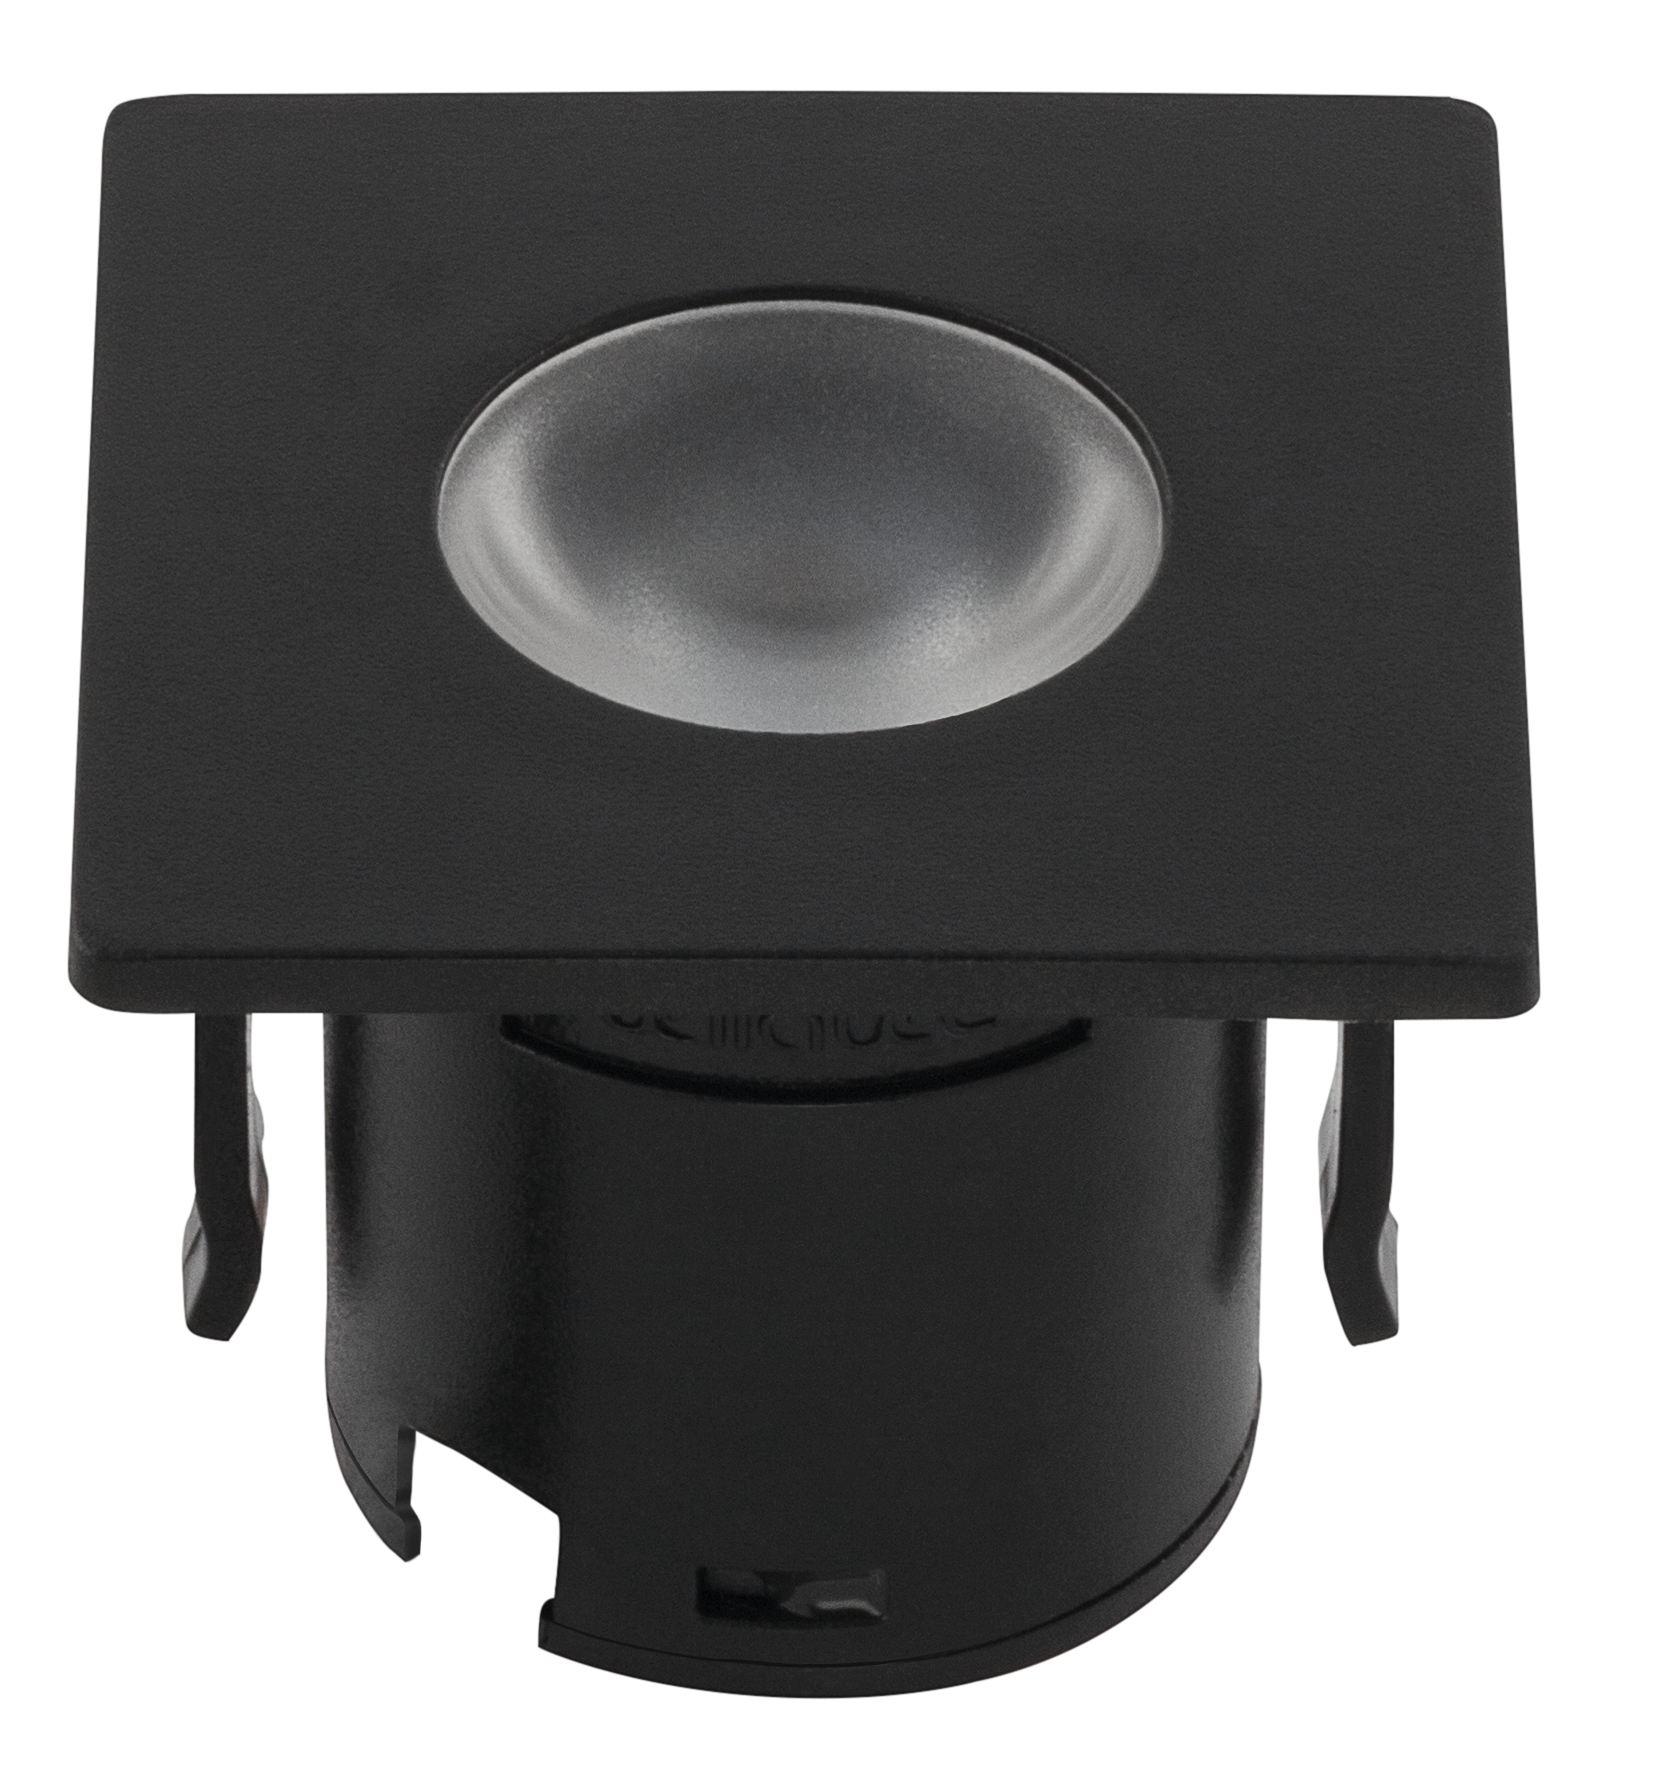 Luminária de Embutir Mini para Móveis 1,2W 80LM 3000K Preto Stella